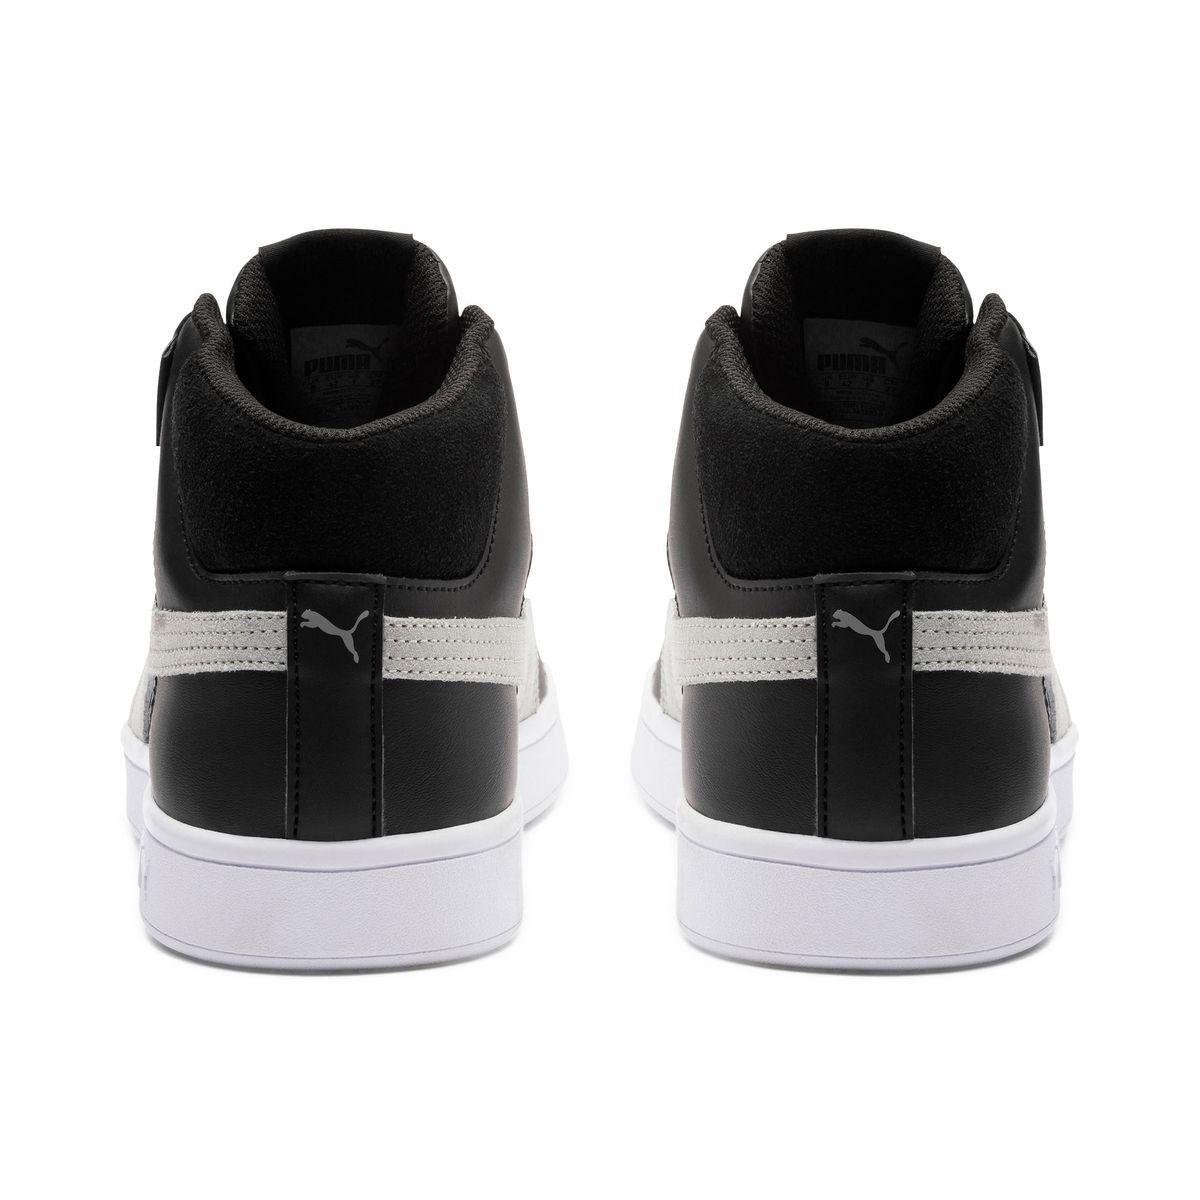 Chaussure Montante Smash V2 Mid Puretex Taille : 36;37;38